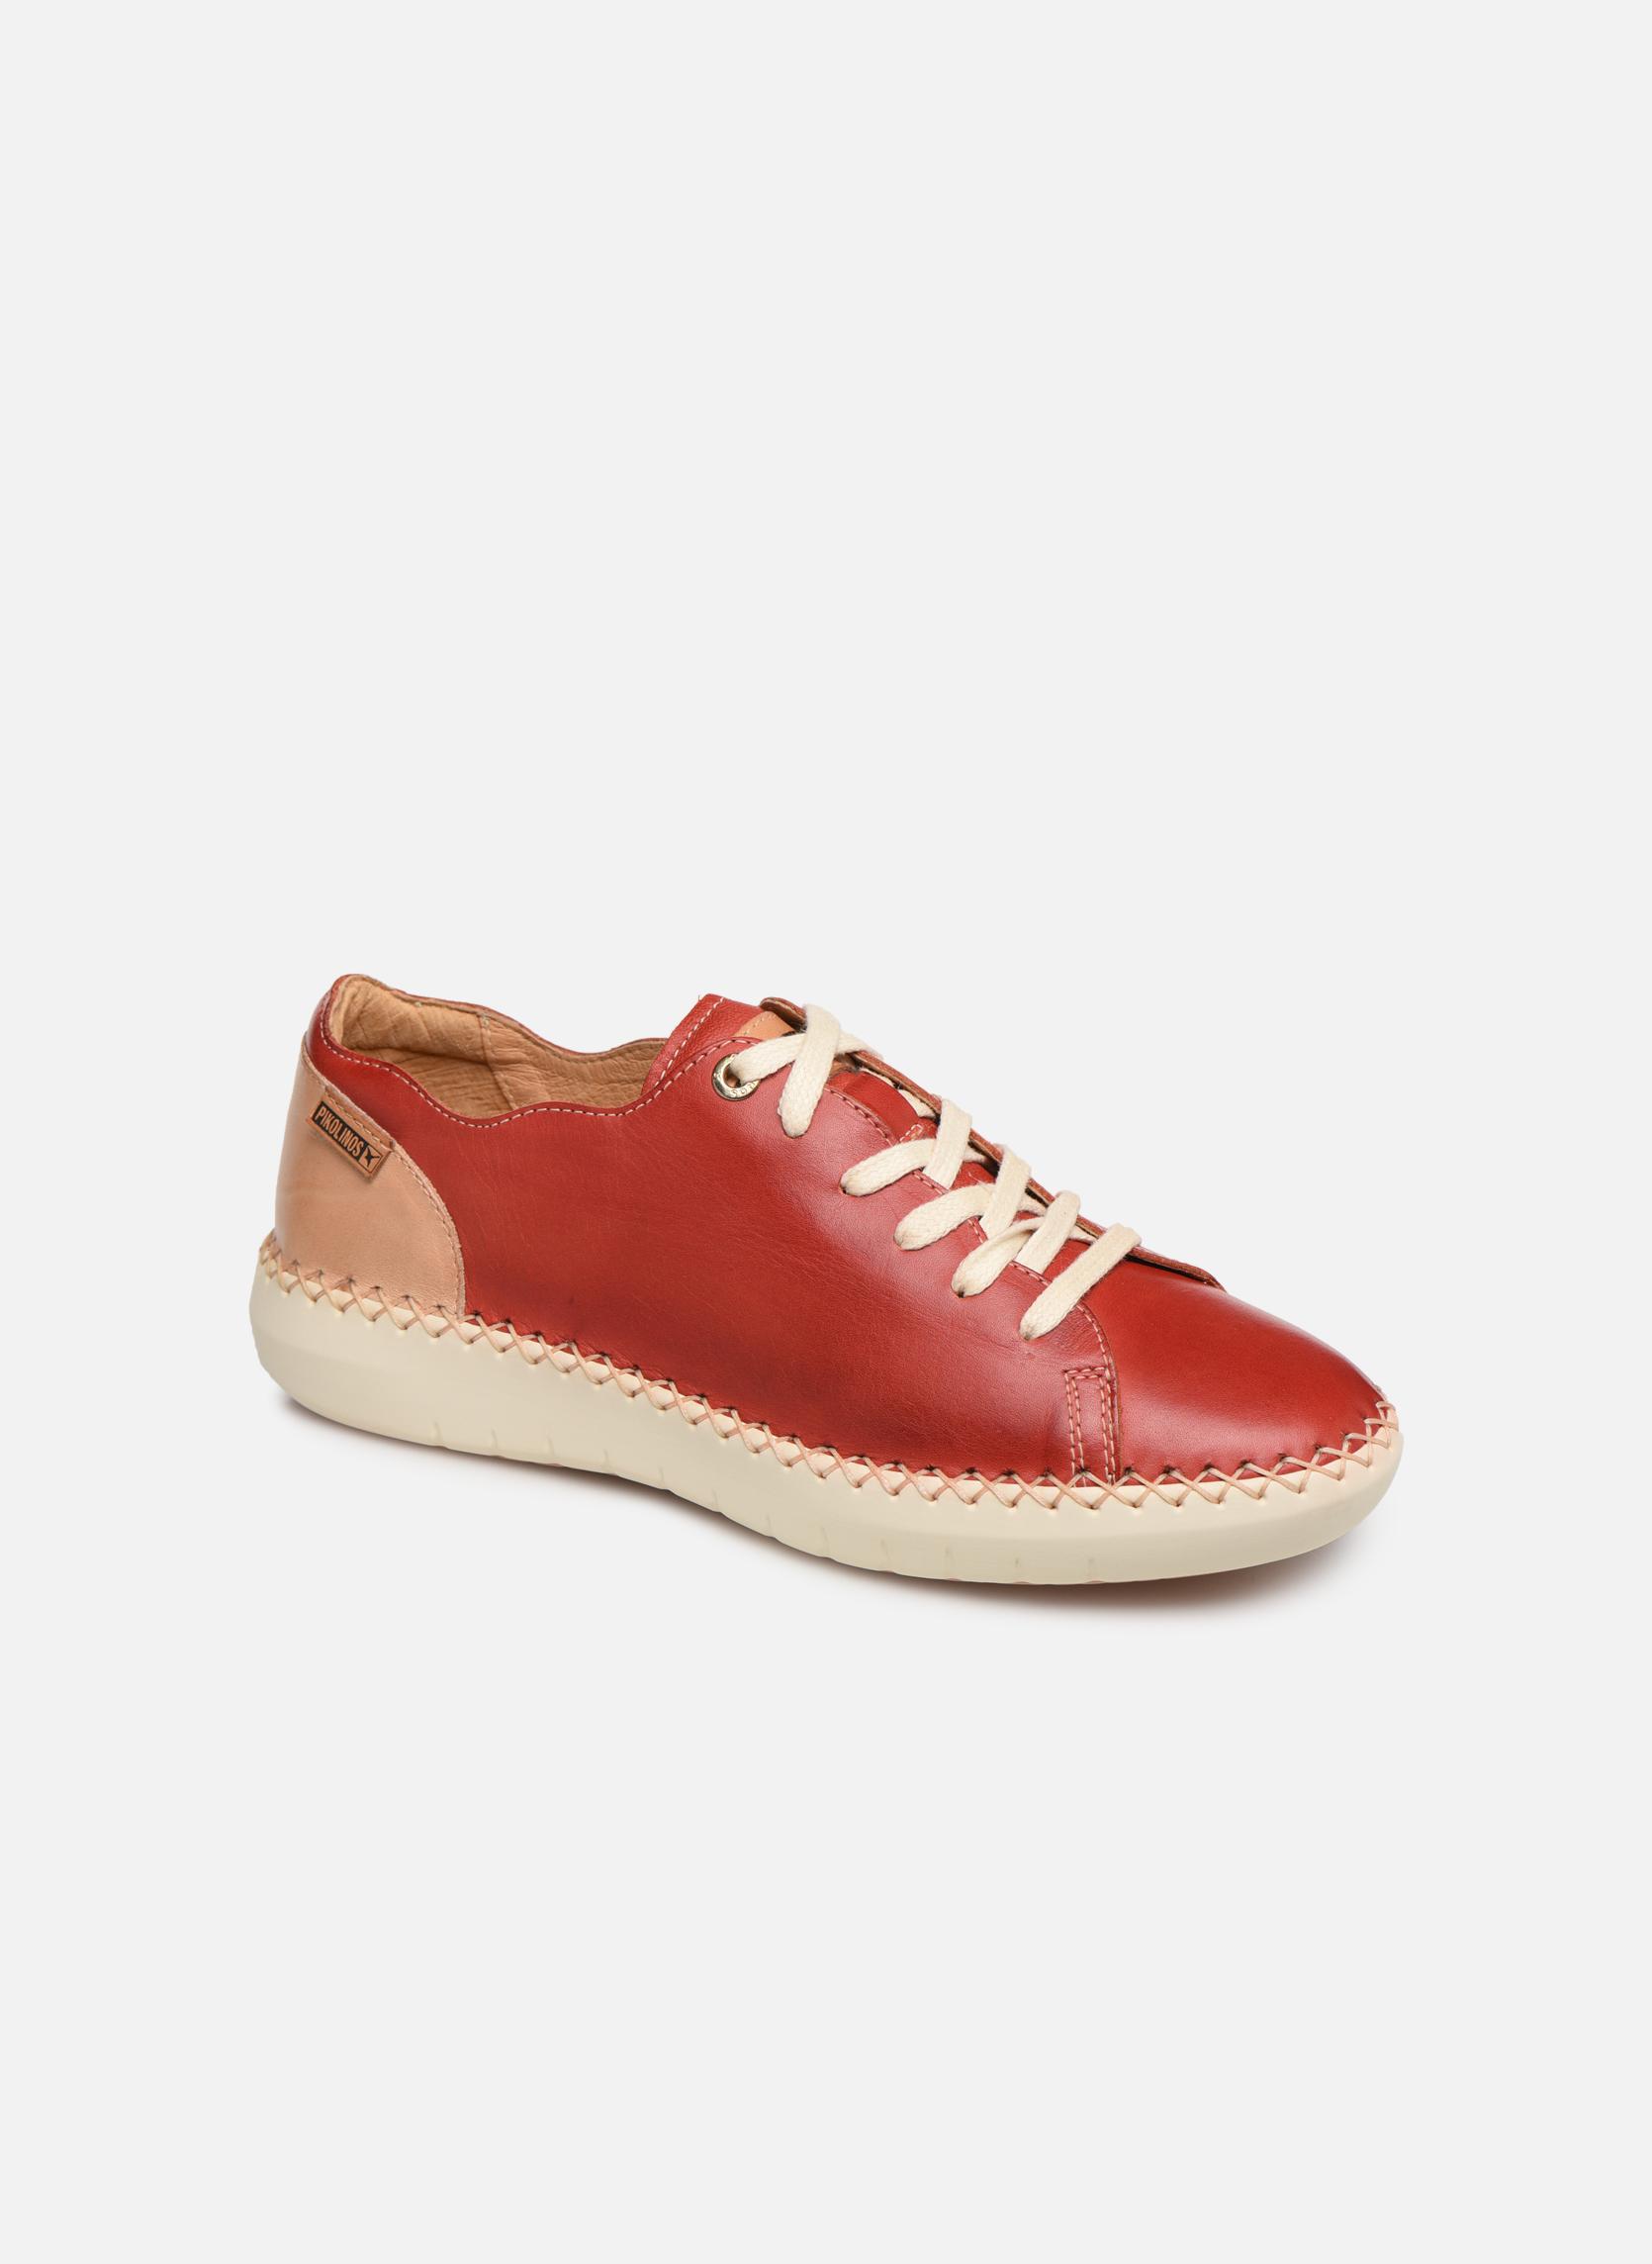 Sneakers Pikolinos Rood